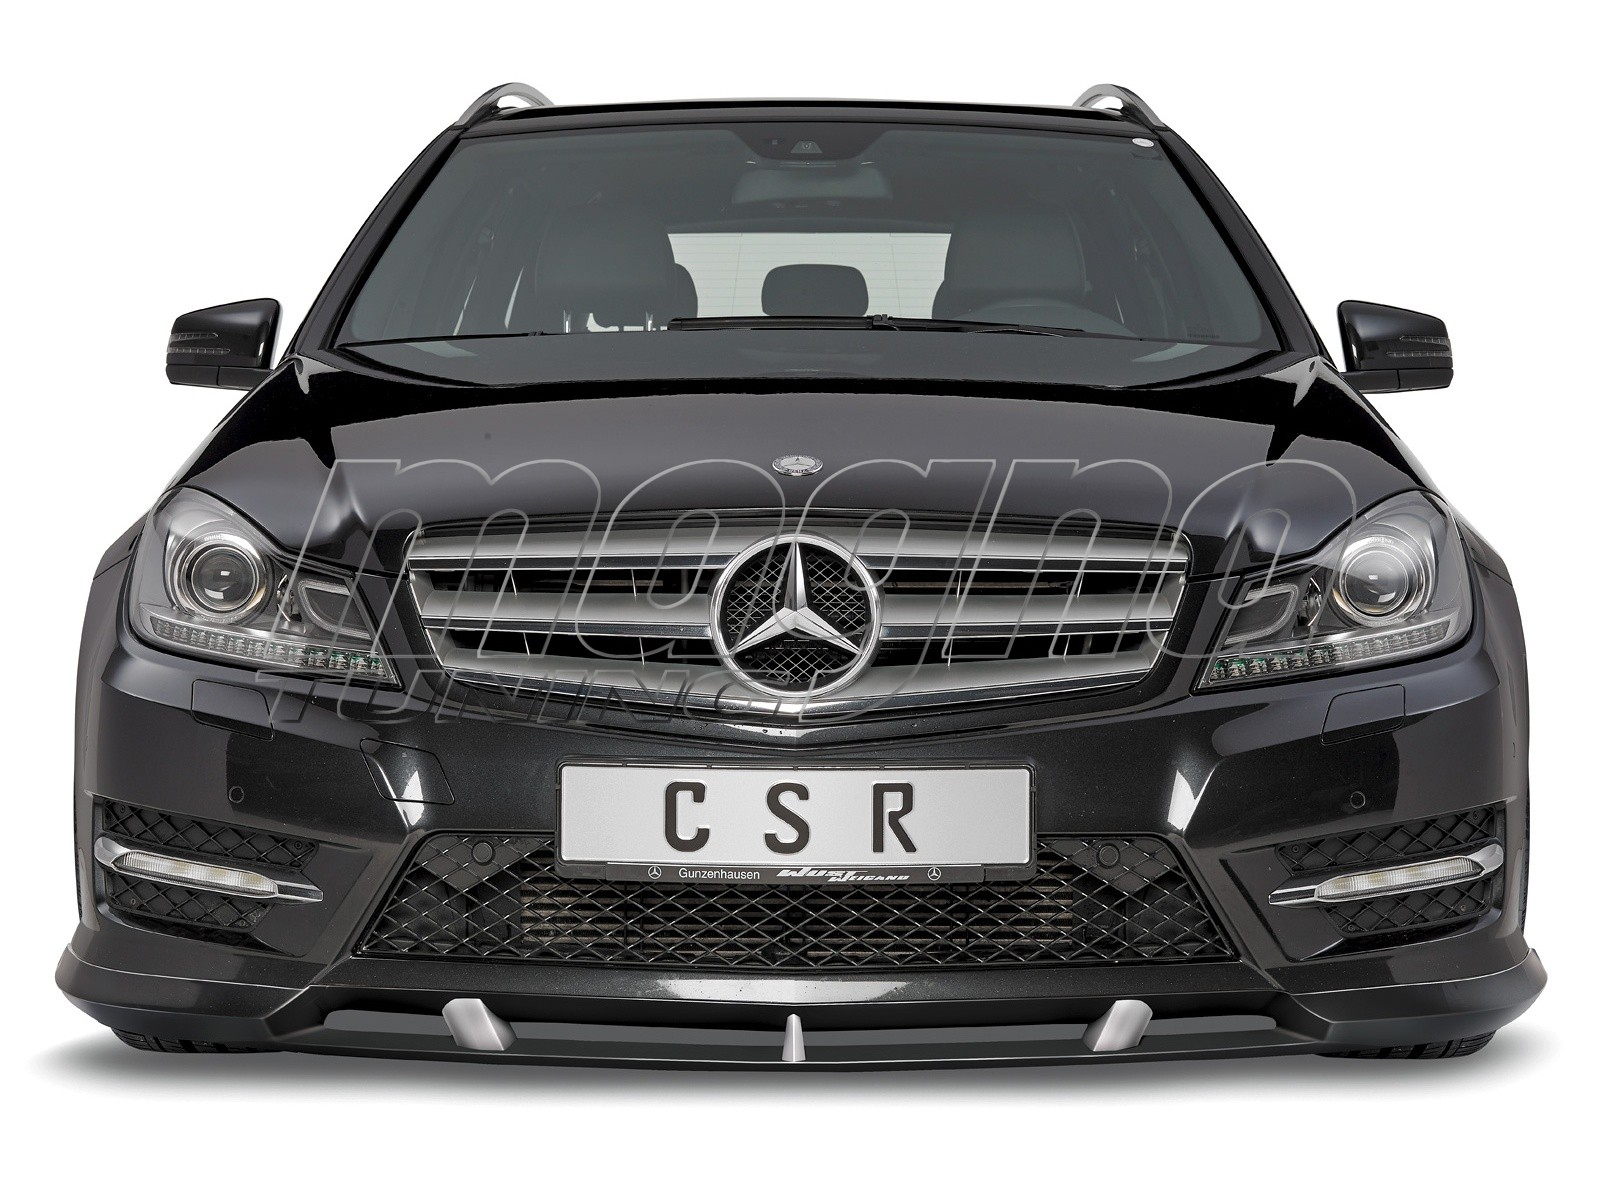 Mercedes C-Class W204 Facelift Crono Body Kit